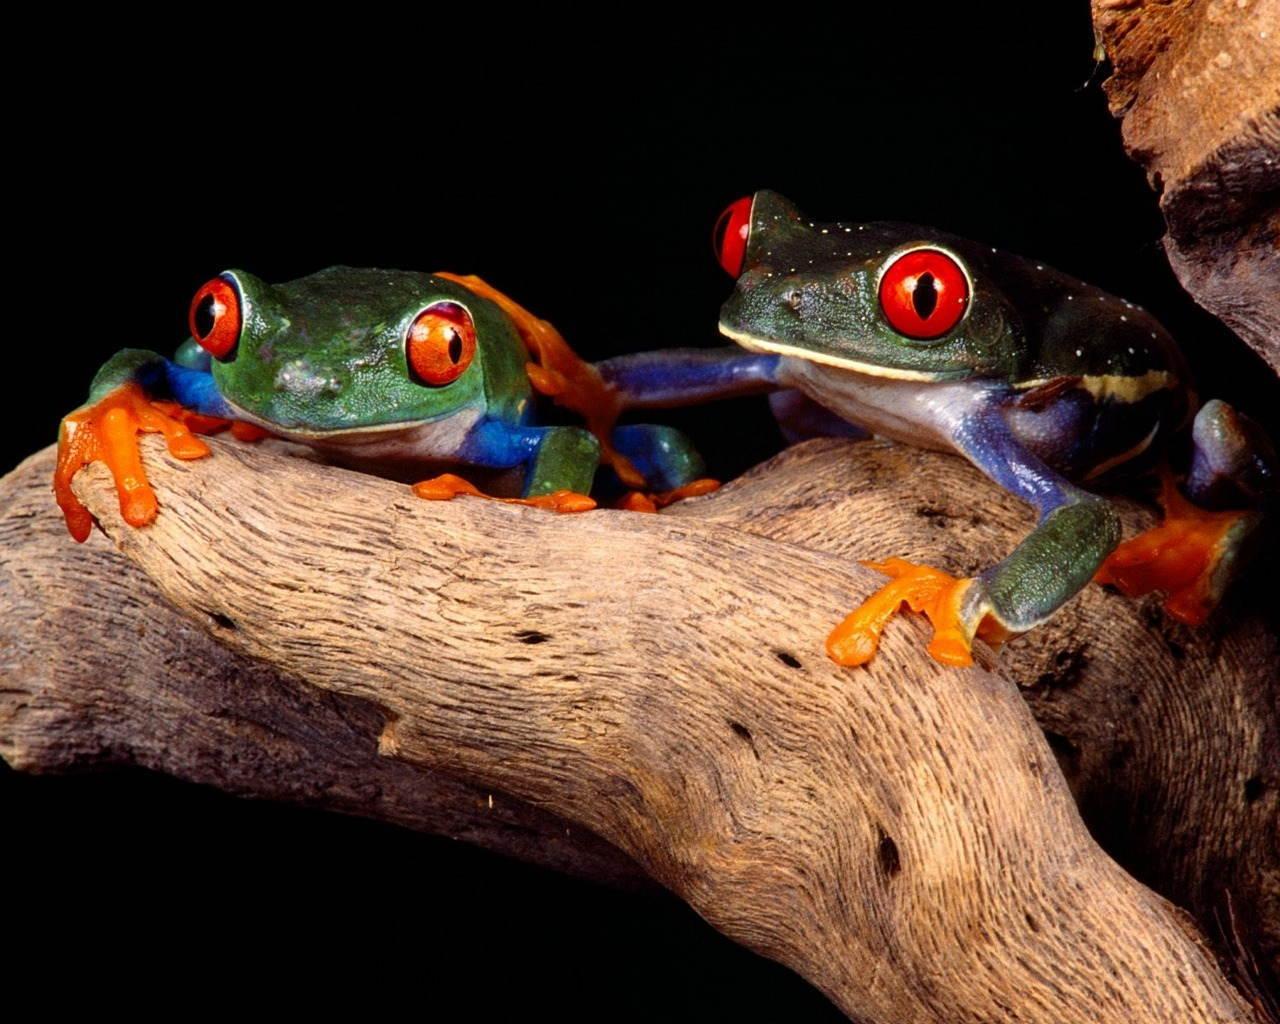 25-Most-Beautiful-Animals-Photography-StumbleUpon-6.jpg